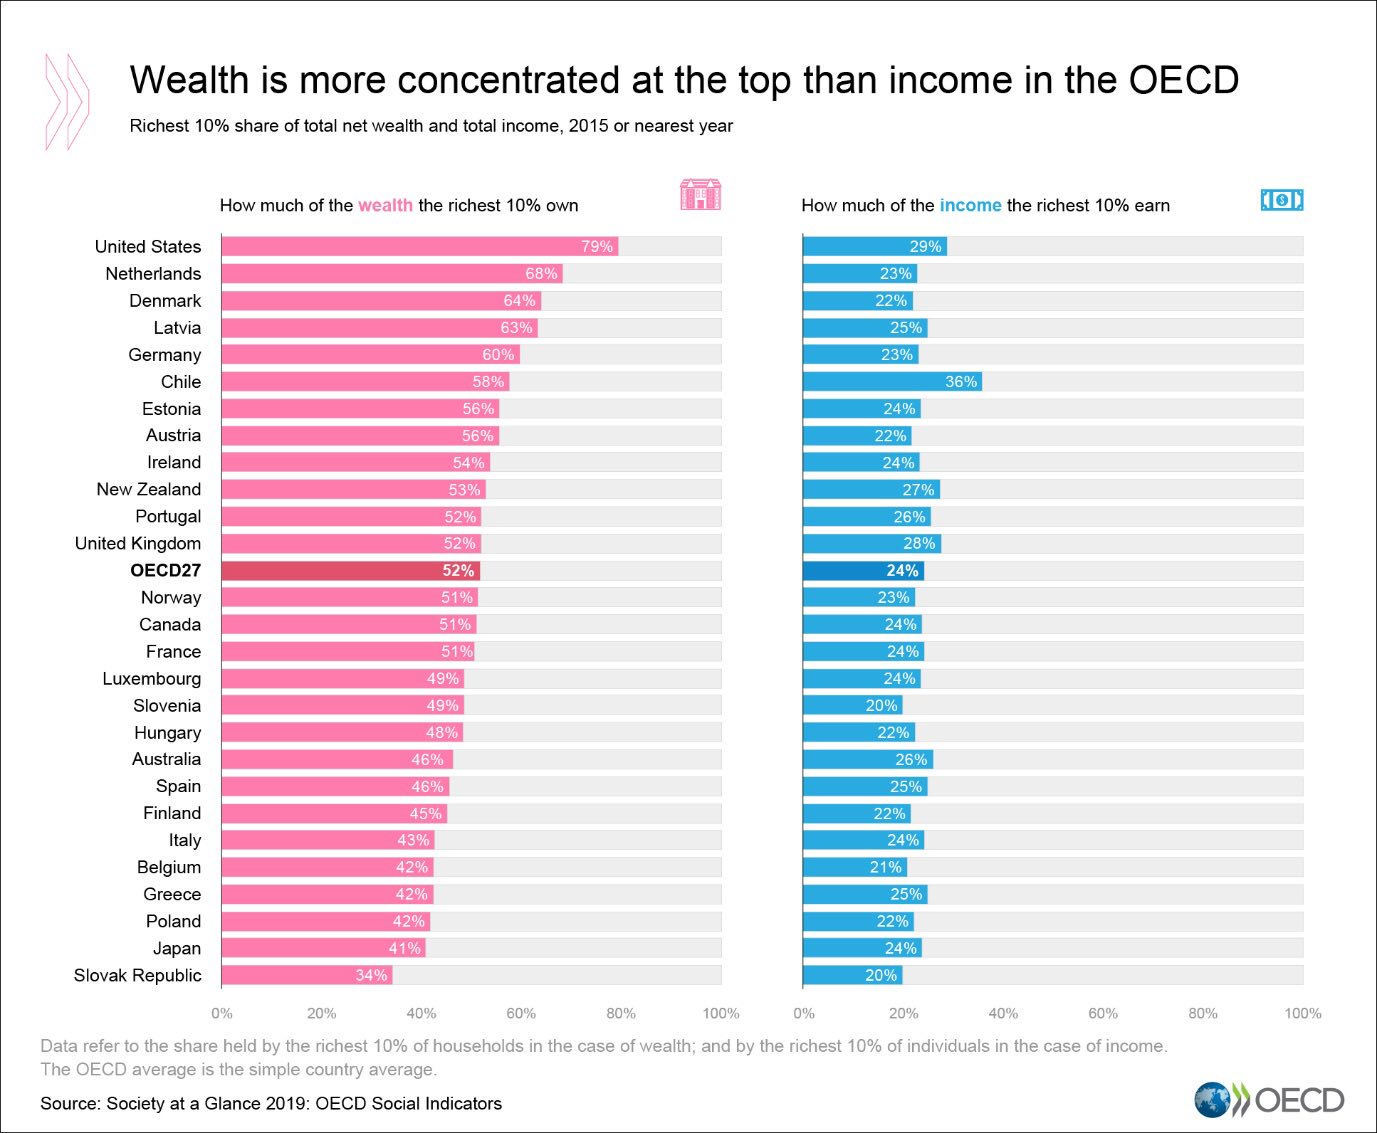 wealth vs. income concentration